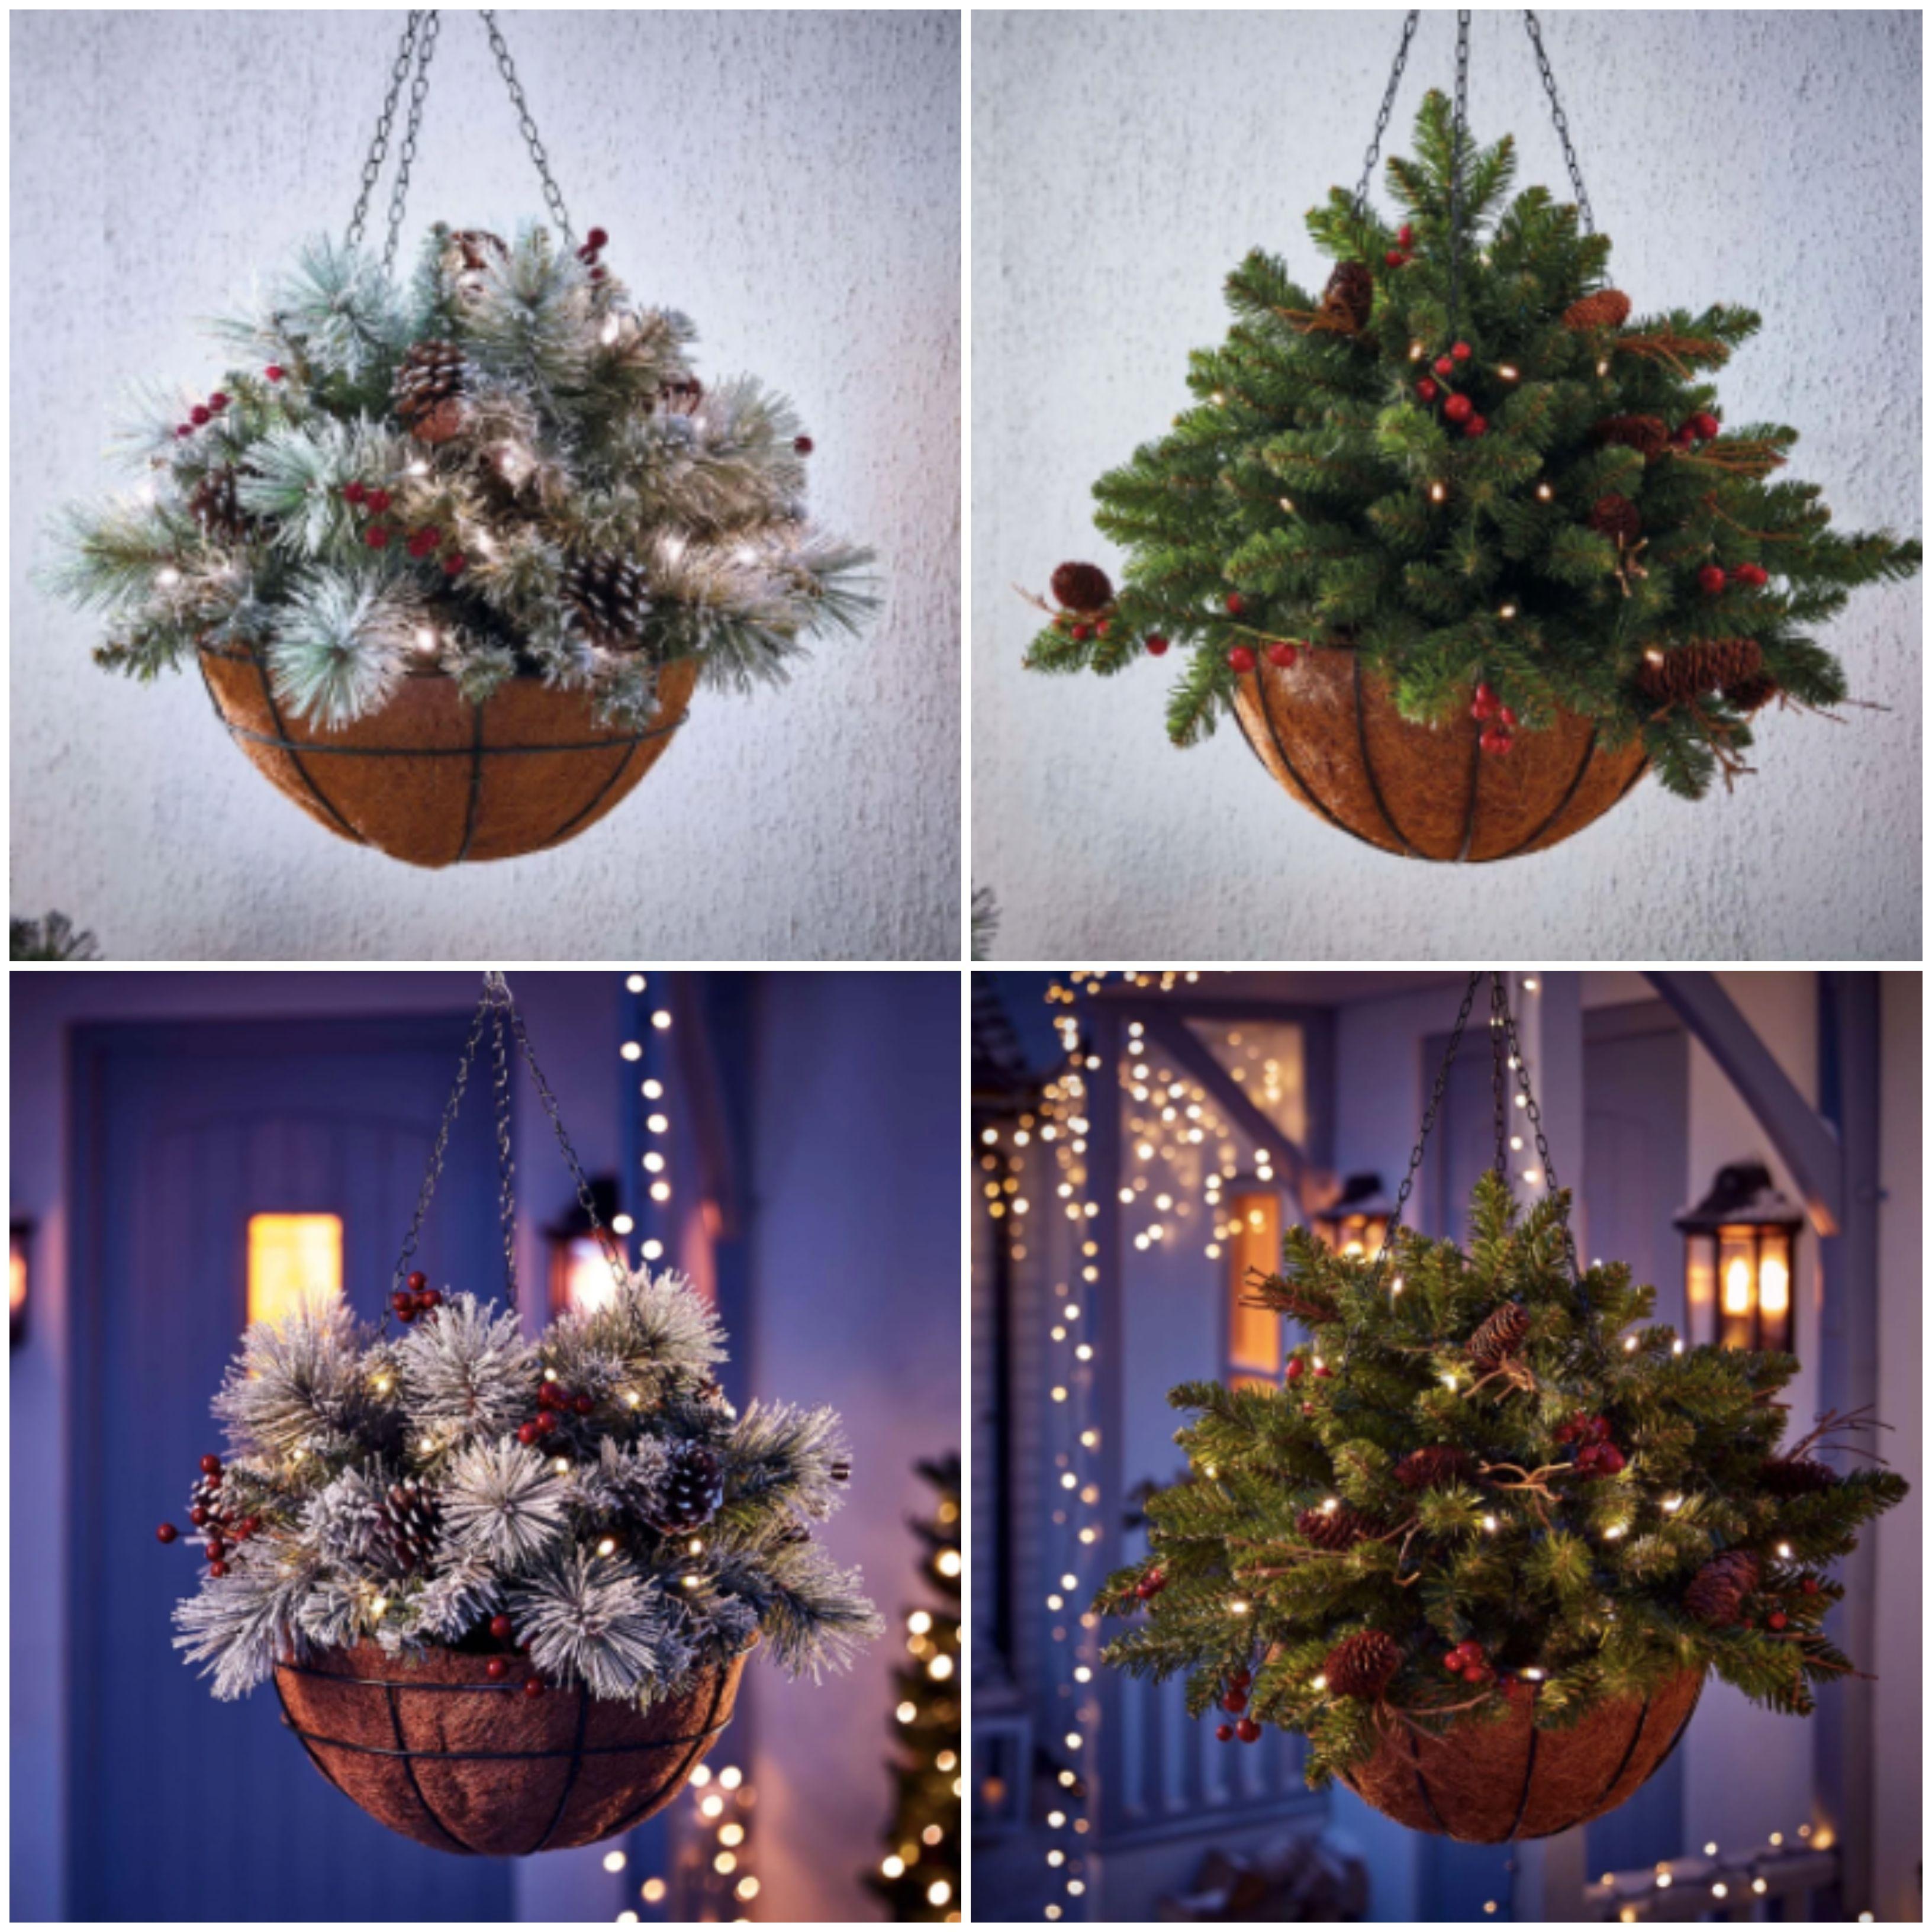 Selling Pre Lit Christmas Hanging Baskets